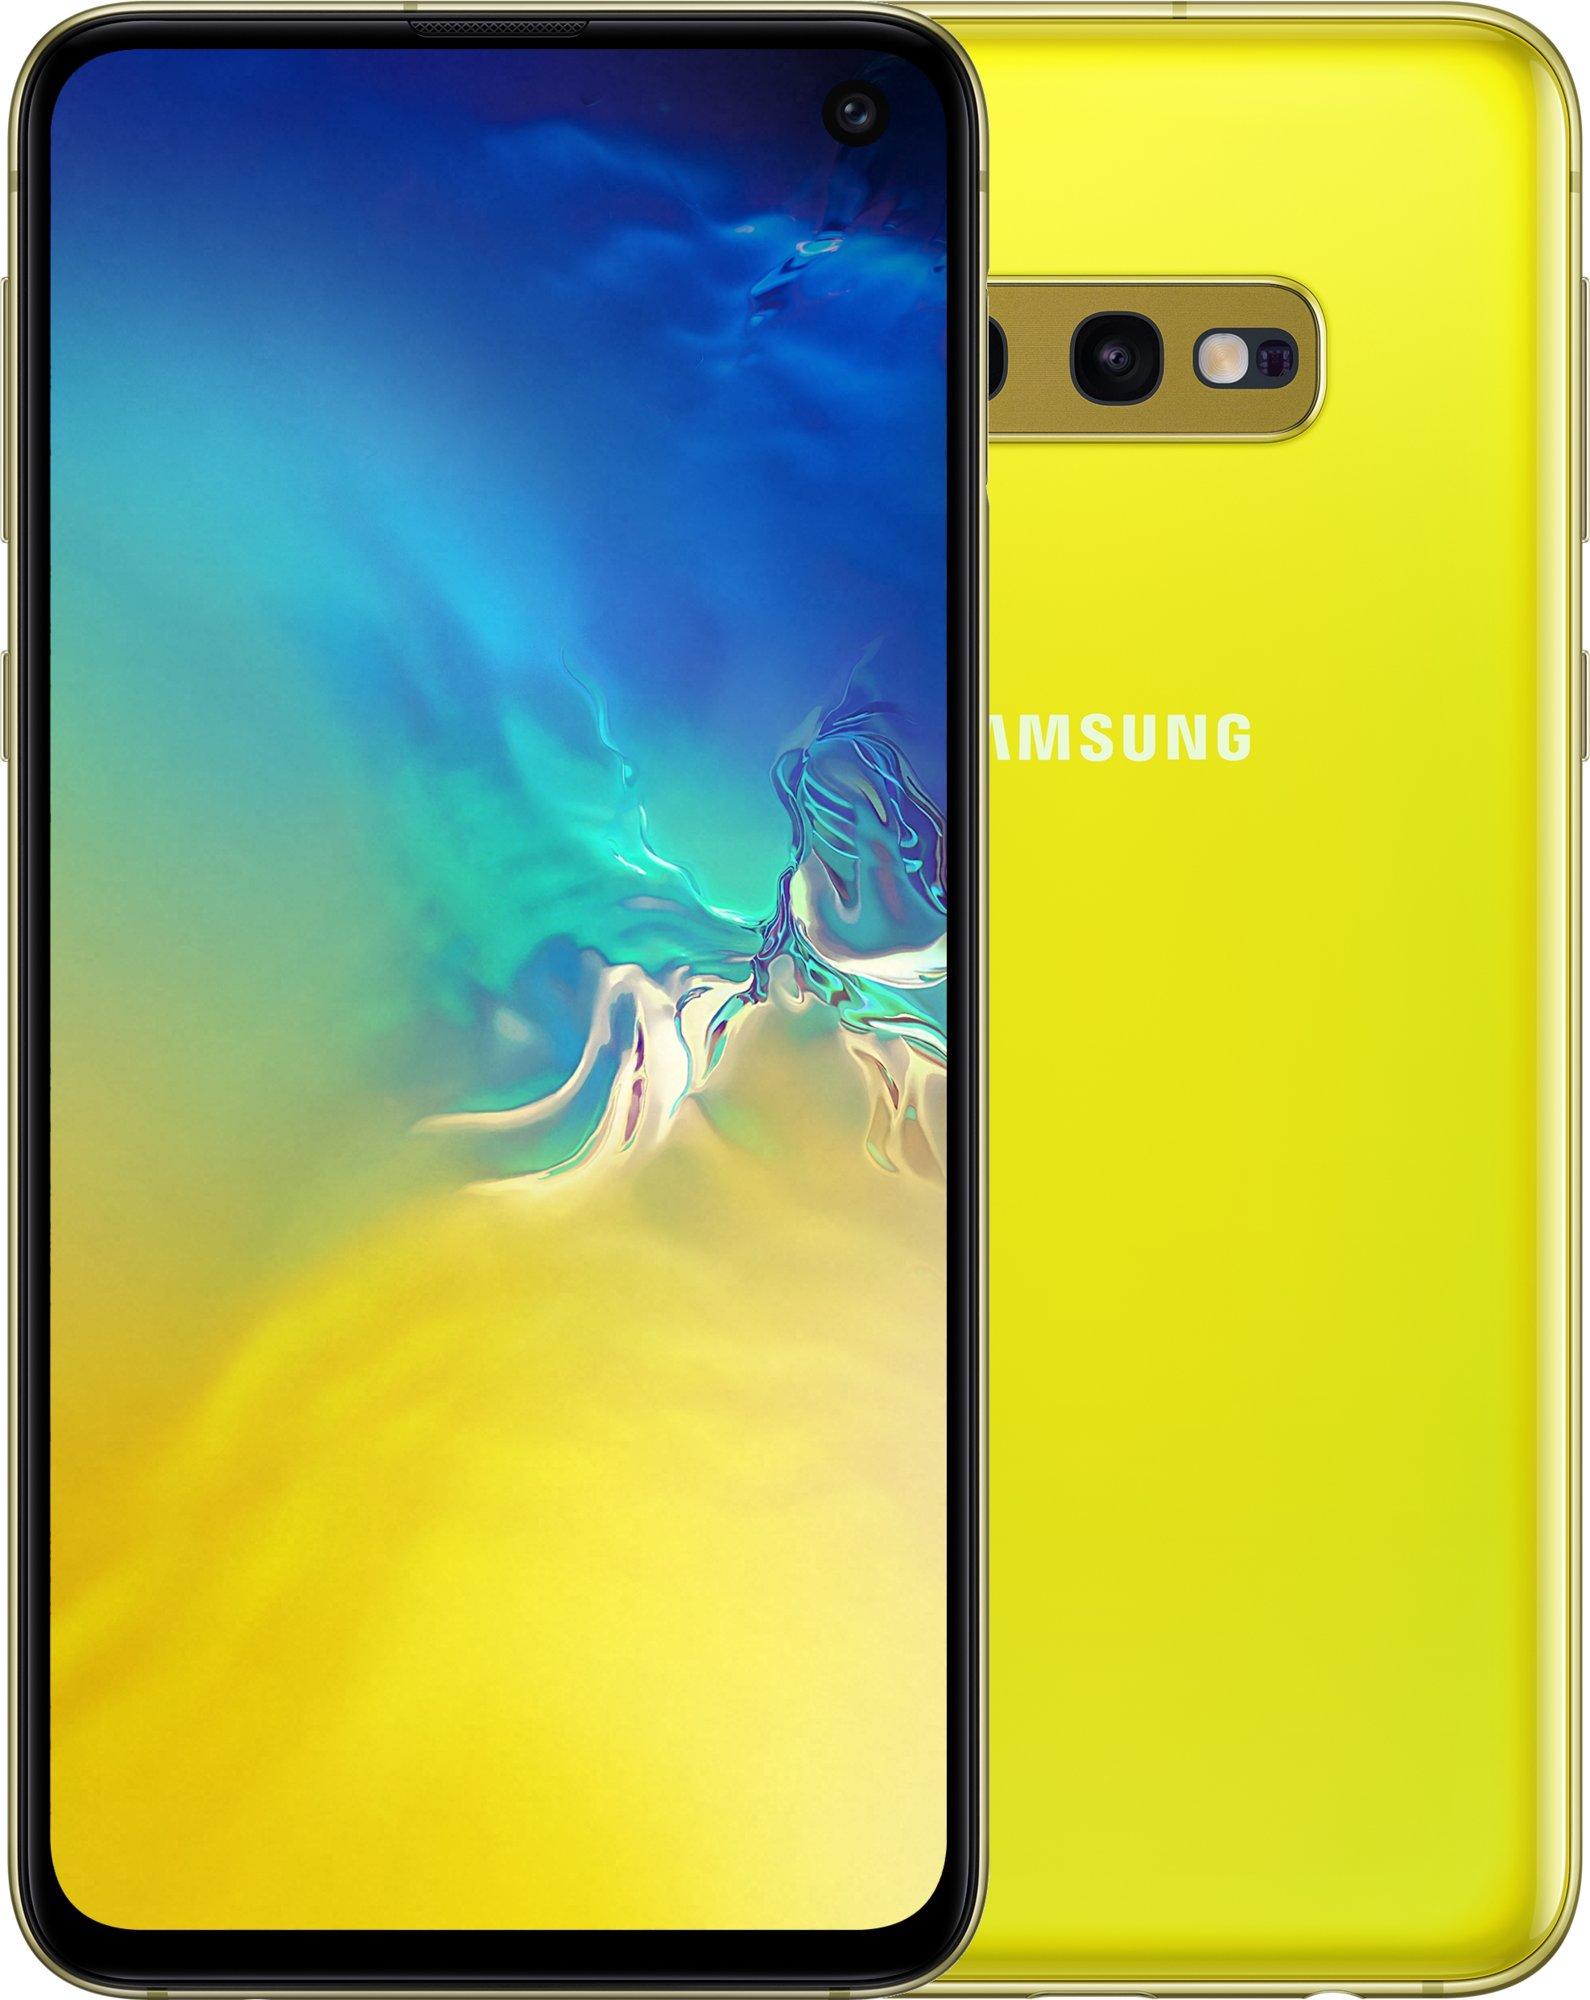 Samsung Galaxy S10e 128GB Dual Sim, Yellow